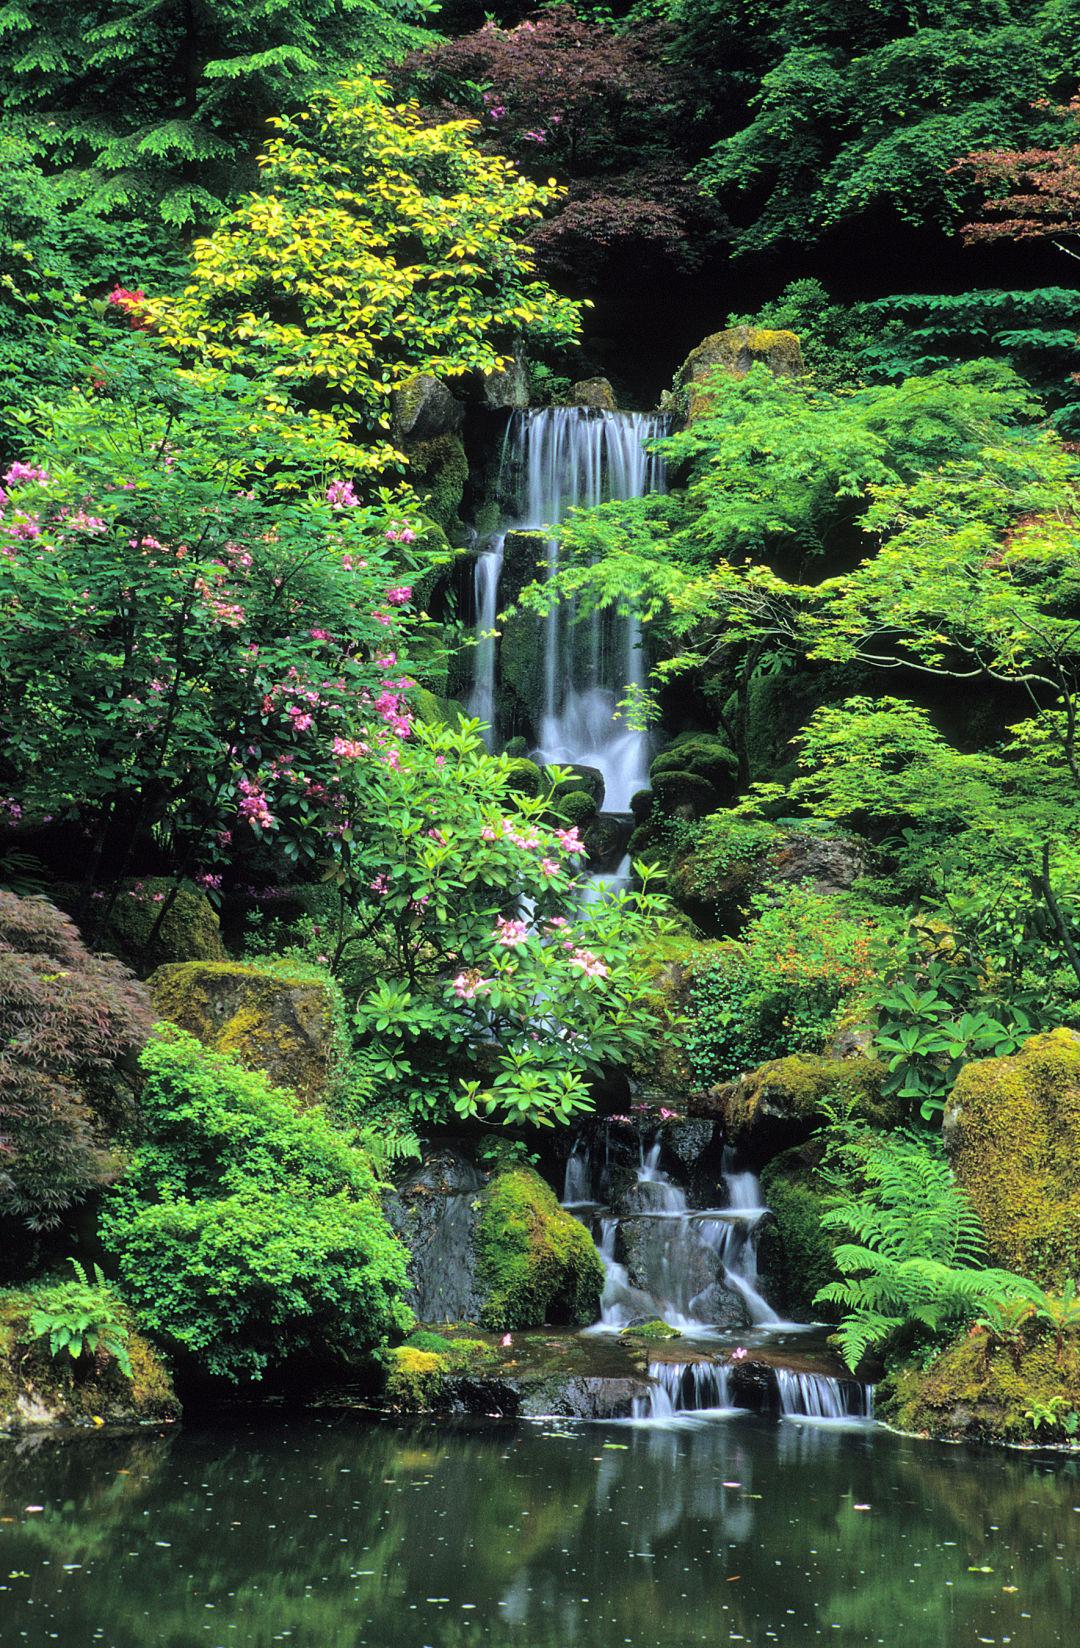 Portland Japanese Garden Store: Portland Japanese Garden Reopens March 1